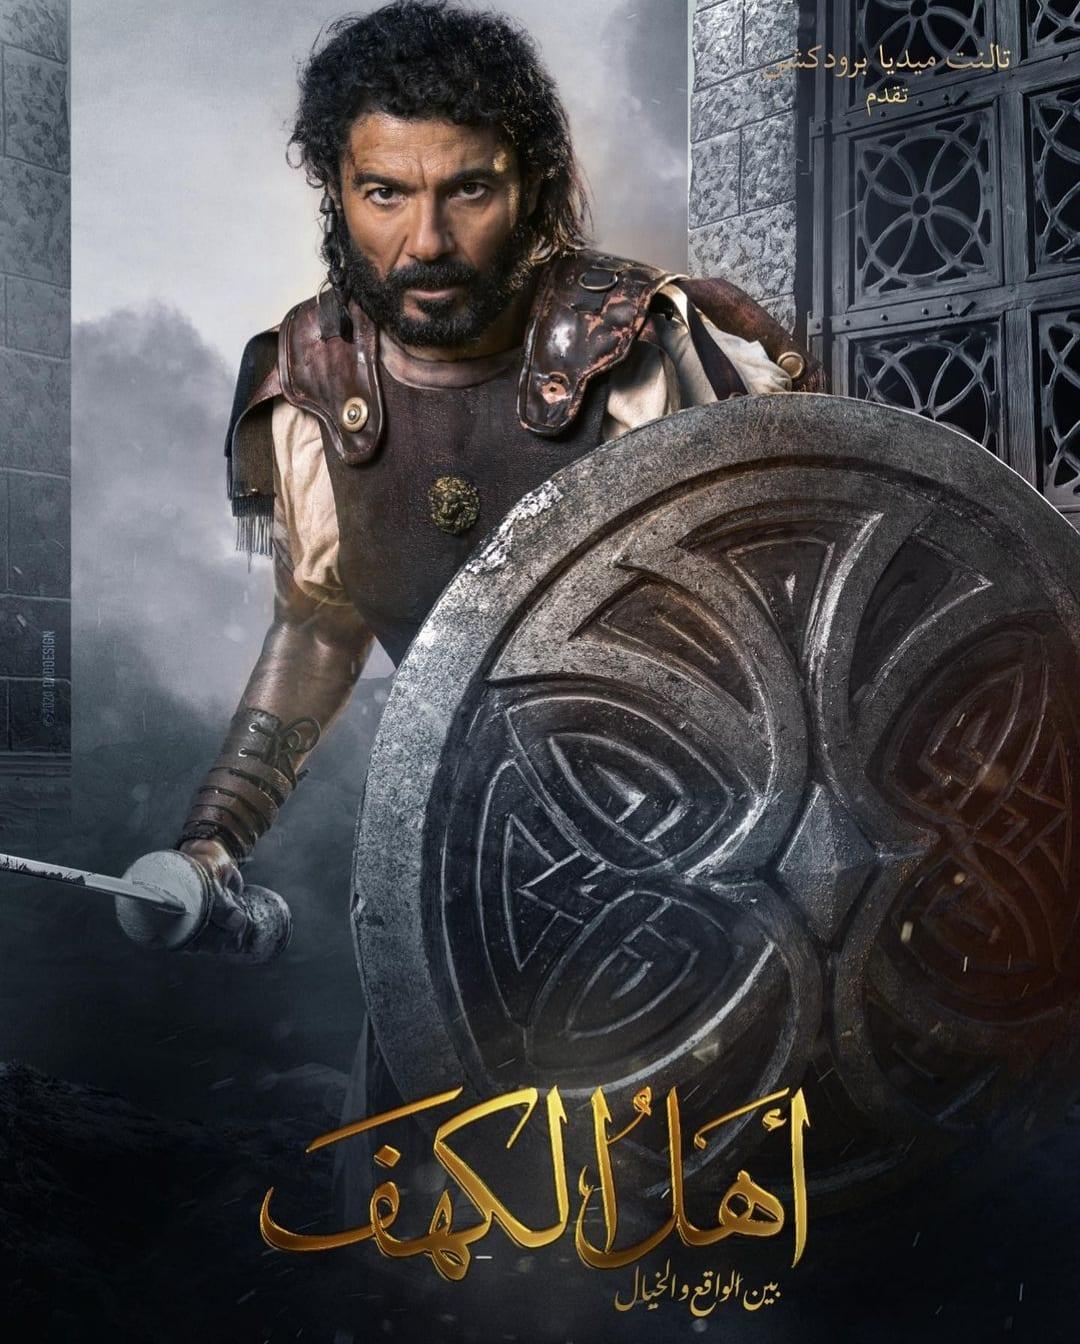 Khaled El Nabawy at Ahl El Kahf Movie